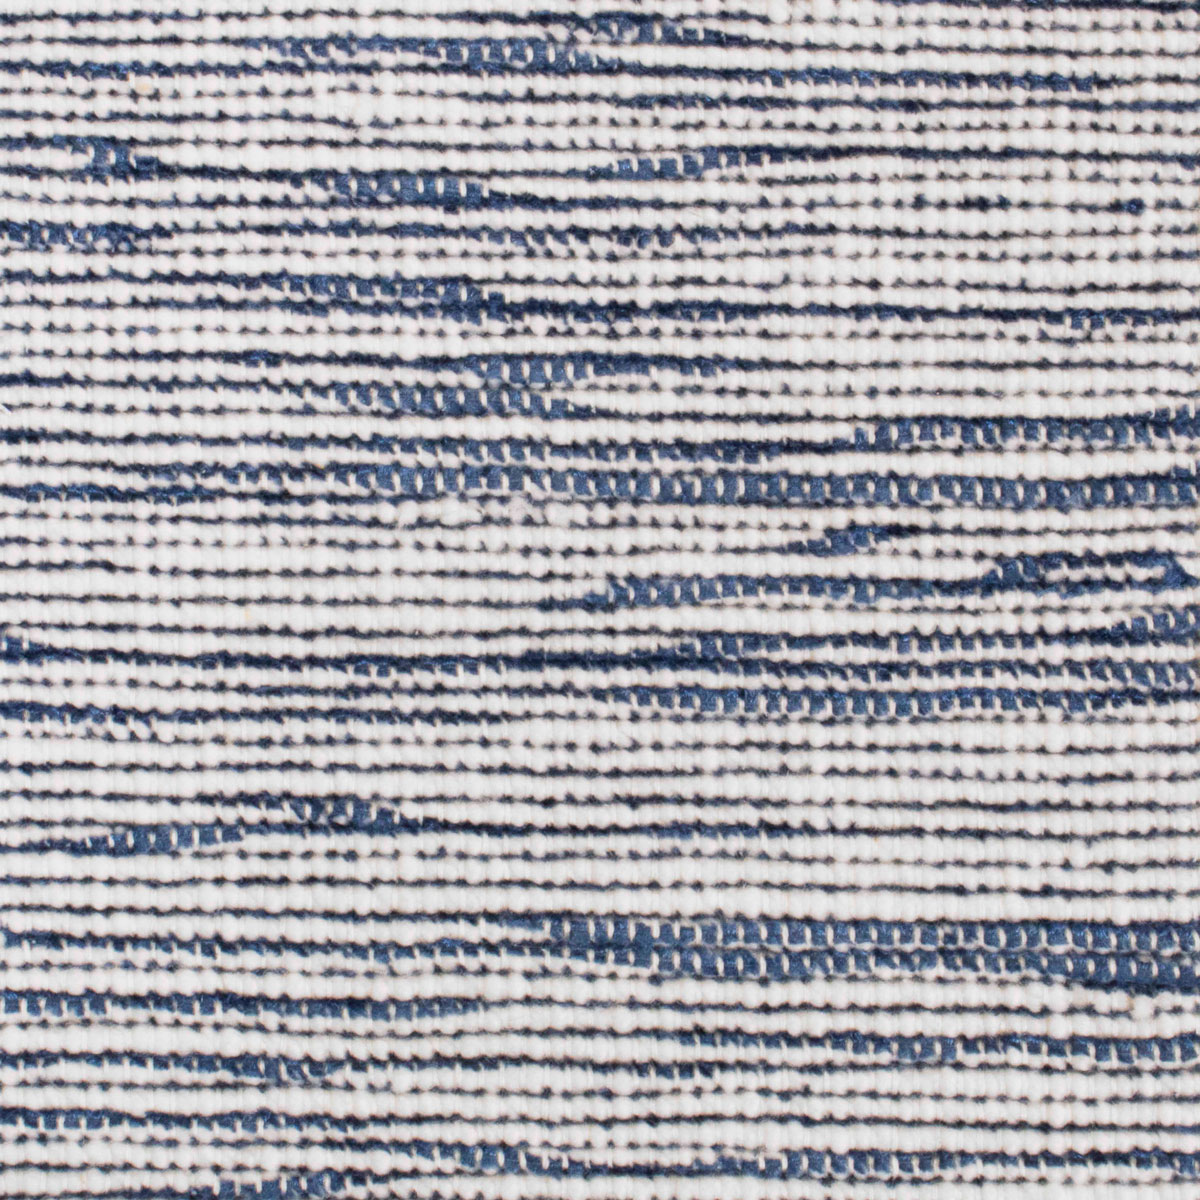 hondo_wool-polyester_broadloom_patterson-flynn-martin_pfm